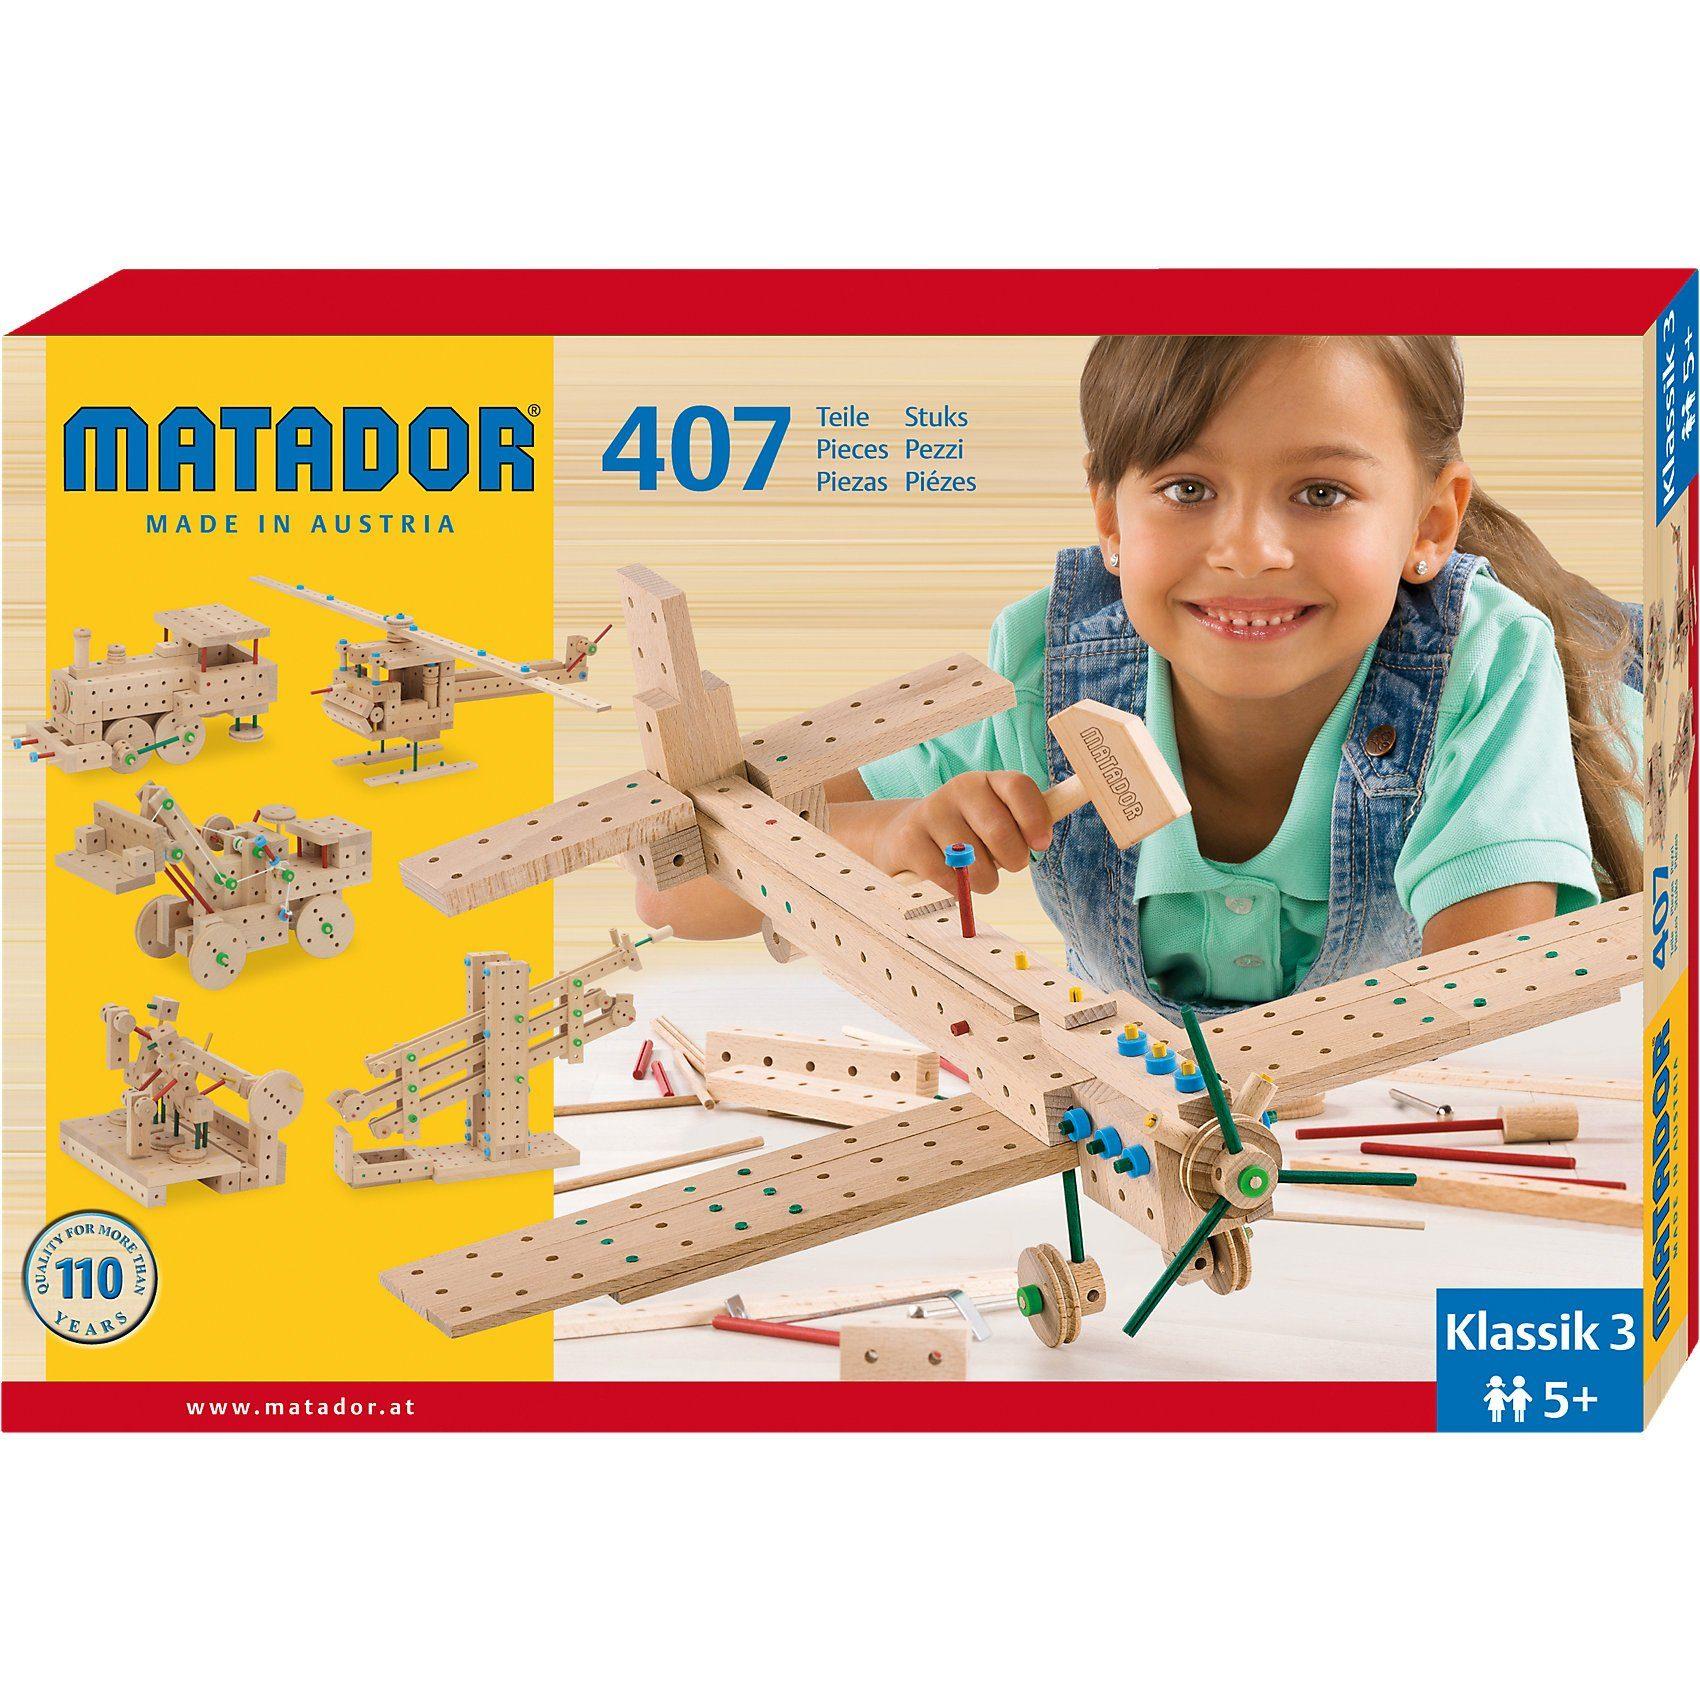 Matador Klassic Nr.3, 407 Teile